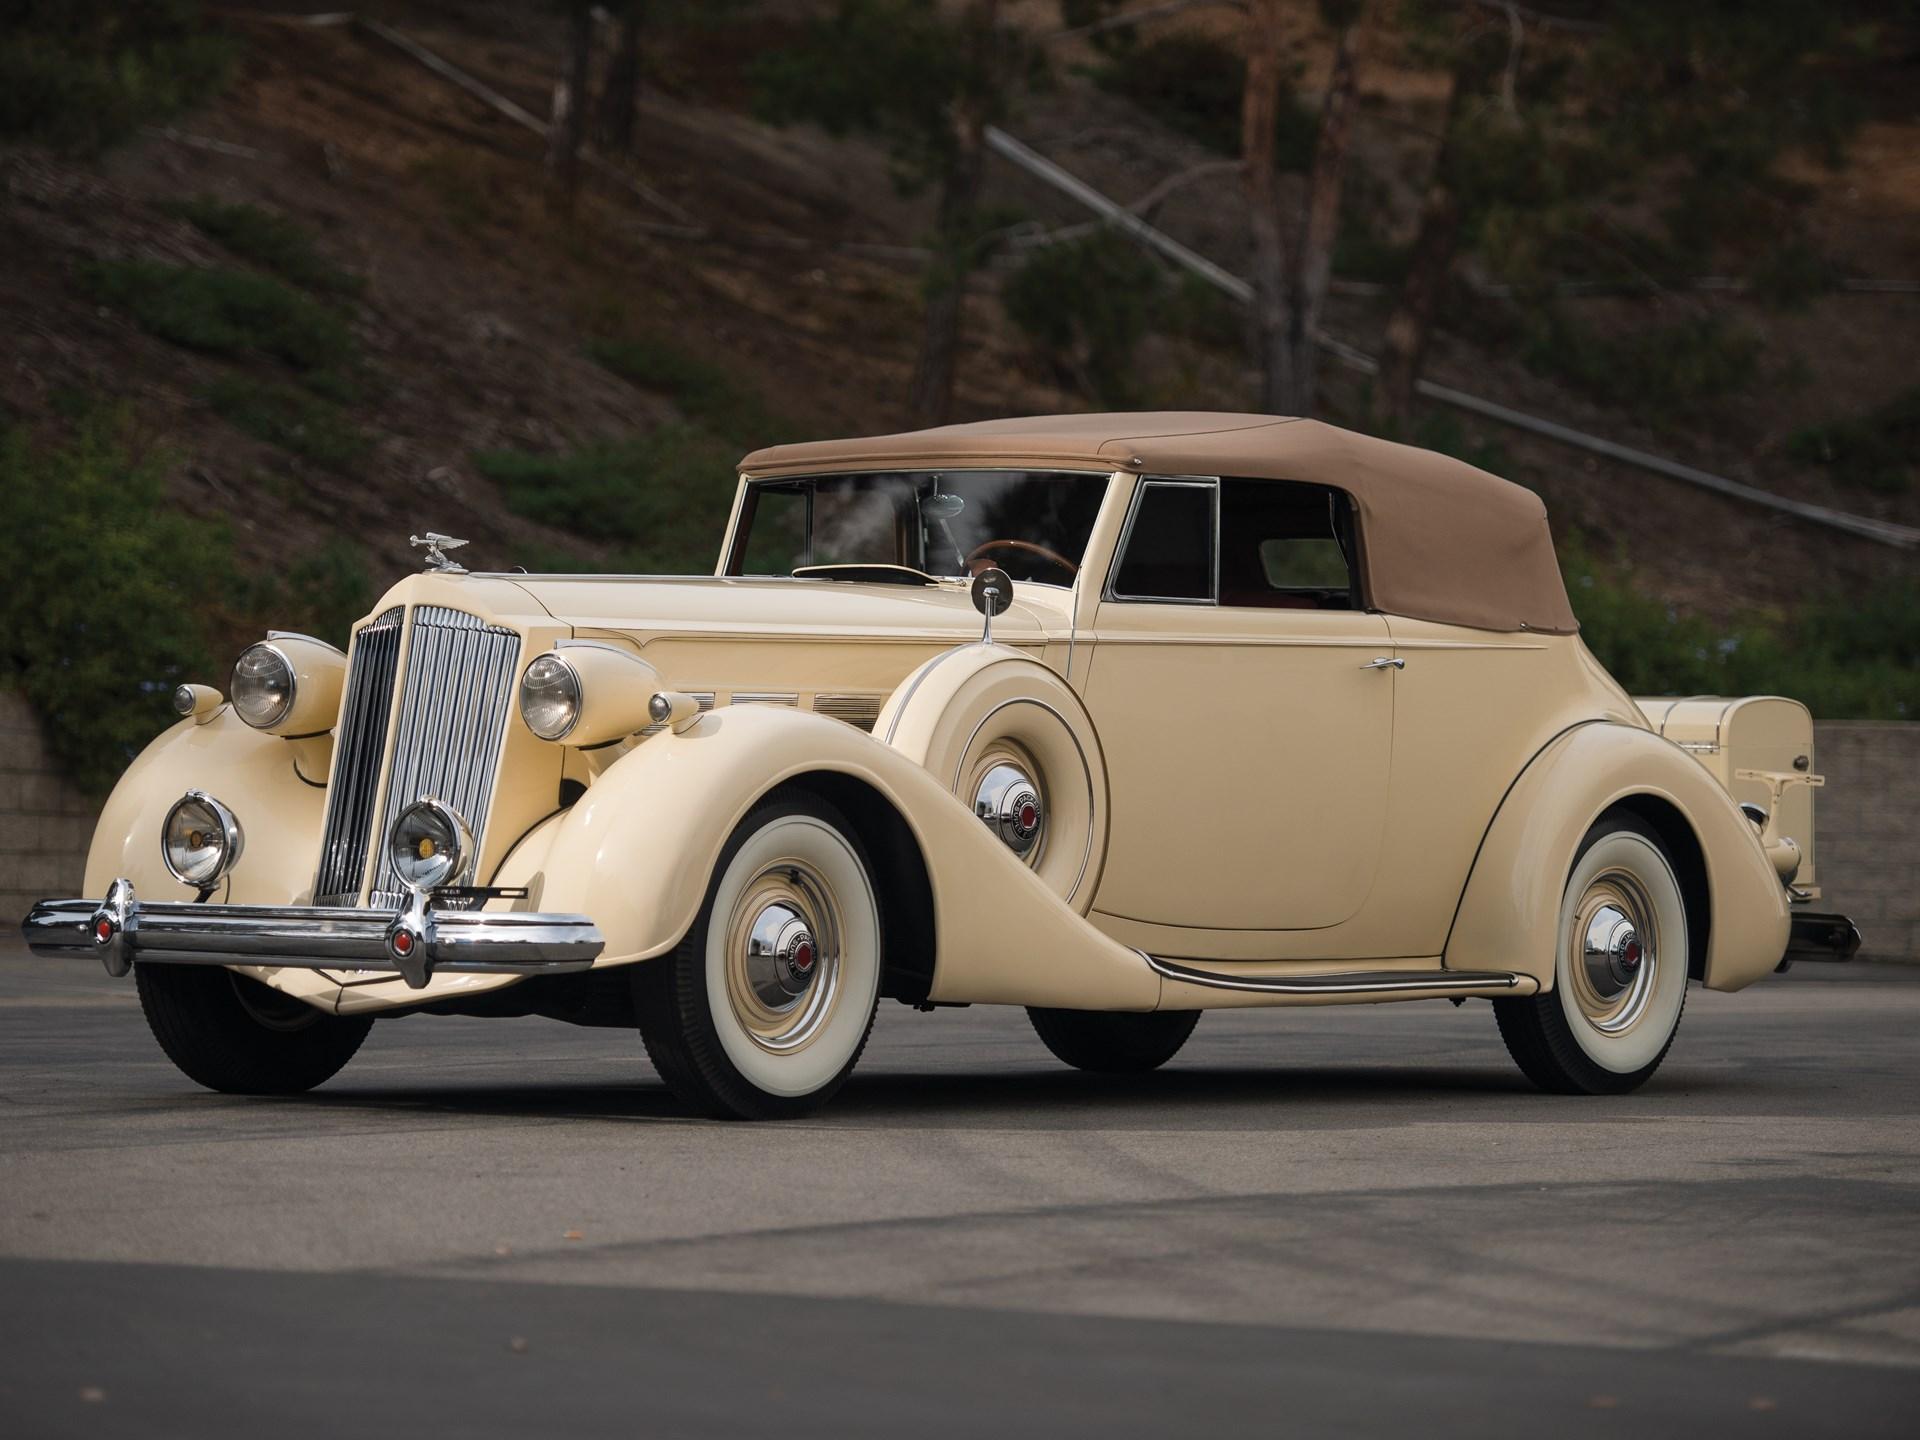 RM Sotheby's - 1937 Packard Super Eight Convertible Victoria